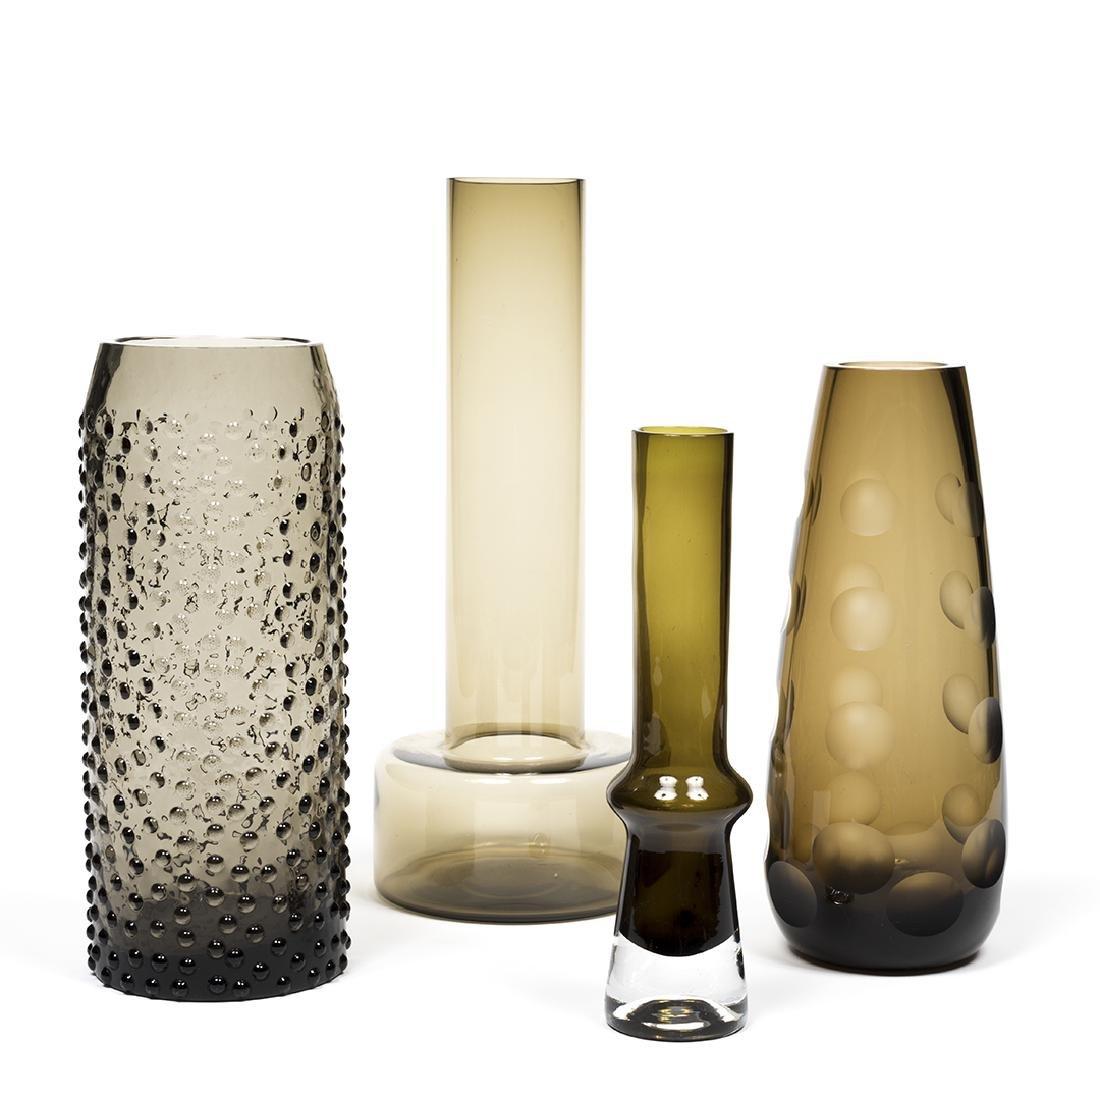 Modernist Smoked Glass (5) - 3